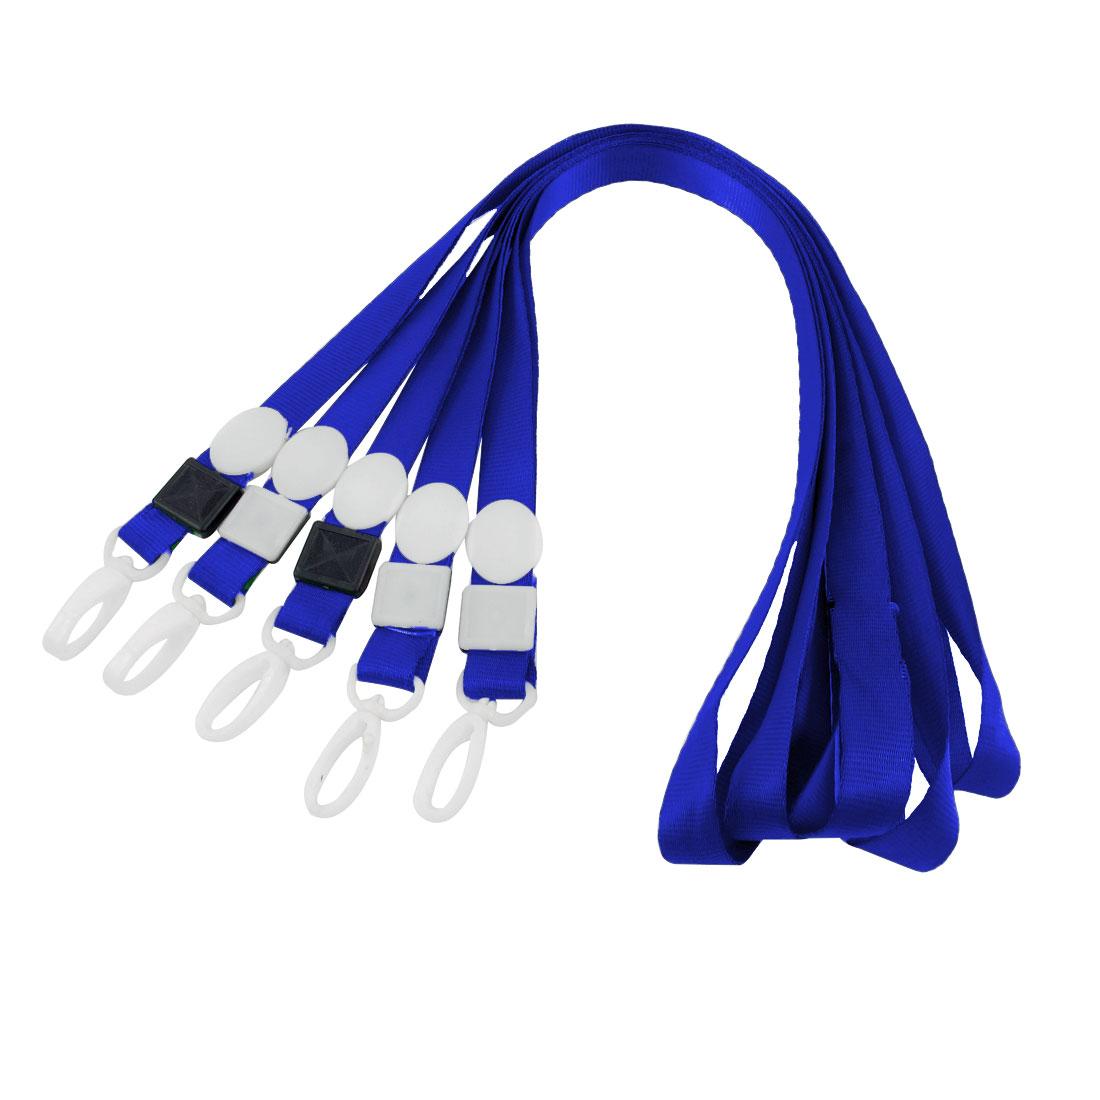 5pcs Swivel Clip ID Card Keys Badge Holder Lanyard Neck Strap Blue 42cm Long